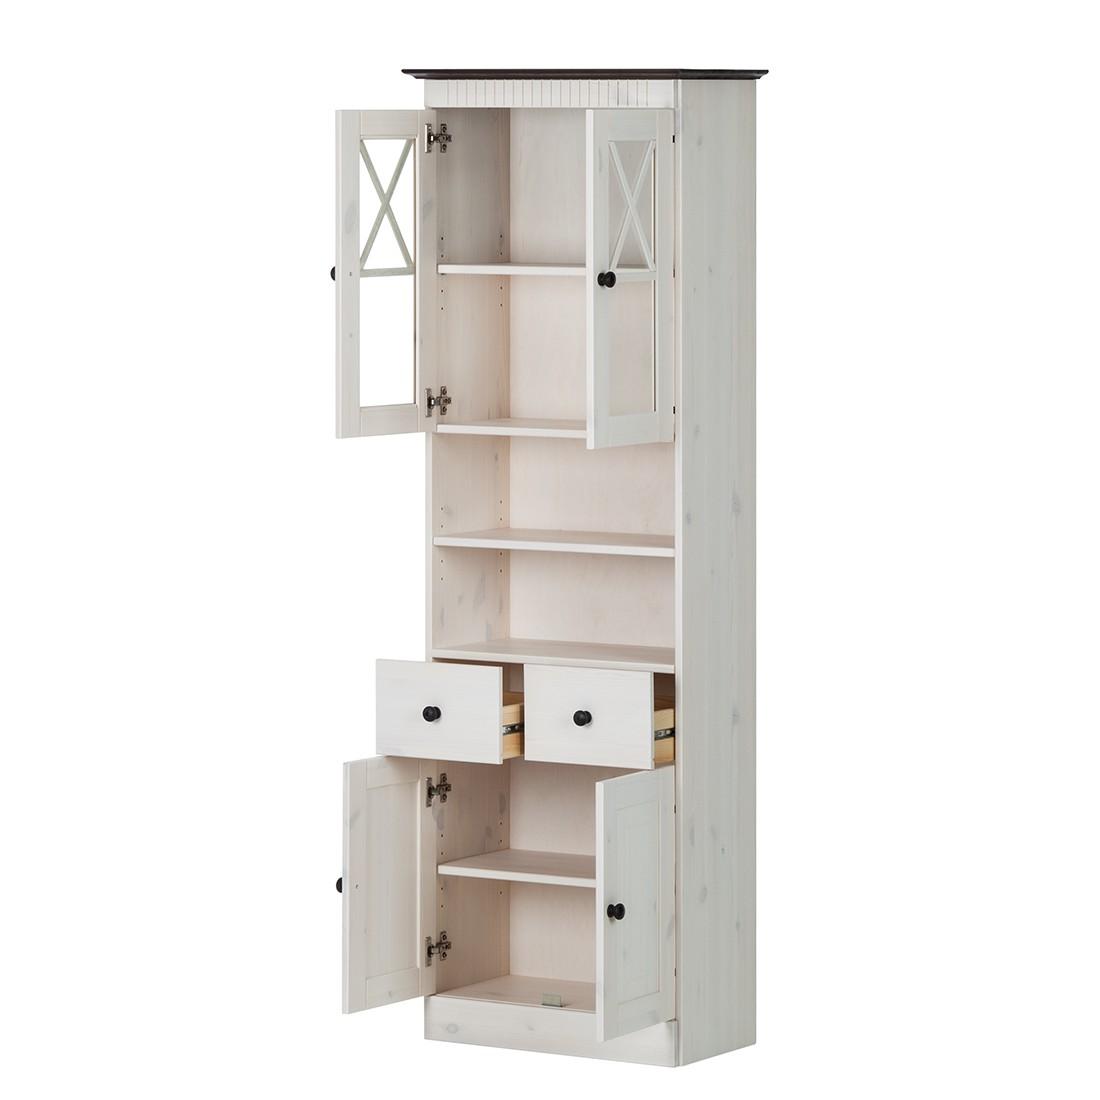 hochschrank senna ii kiefer massiv wei kommode sideboard highboard anrichte ebay. Black Bedroom Furniture Sets. Home Design Ideas